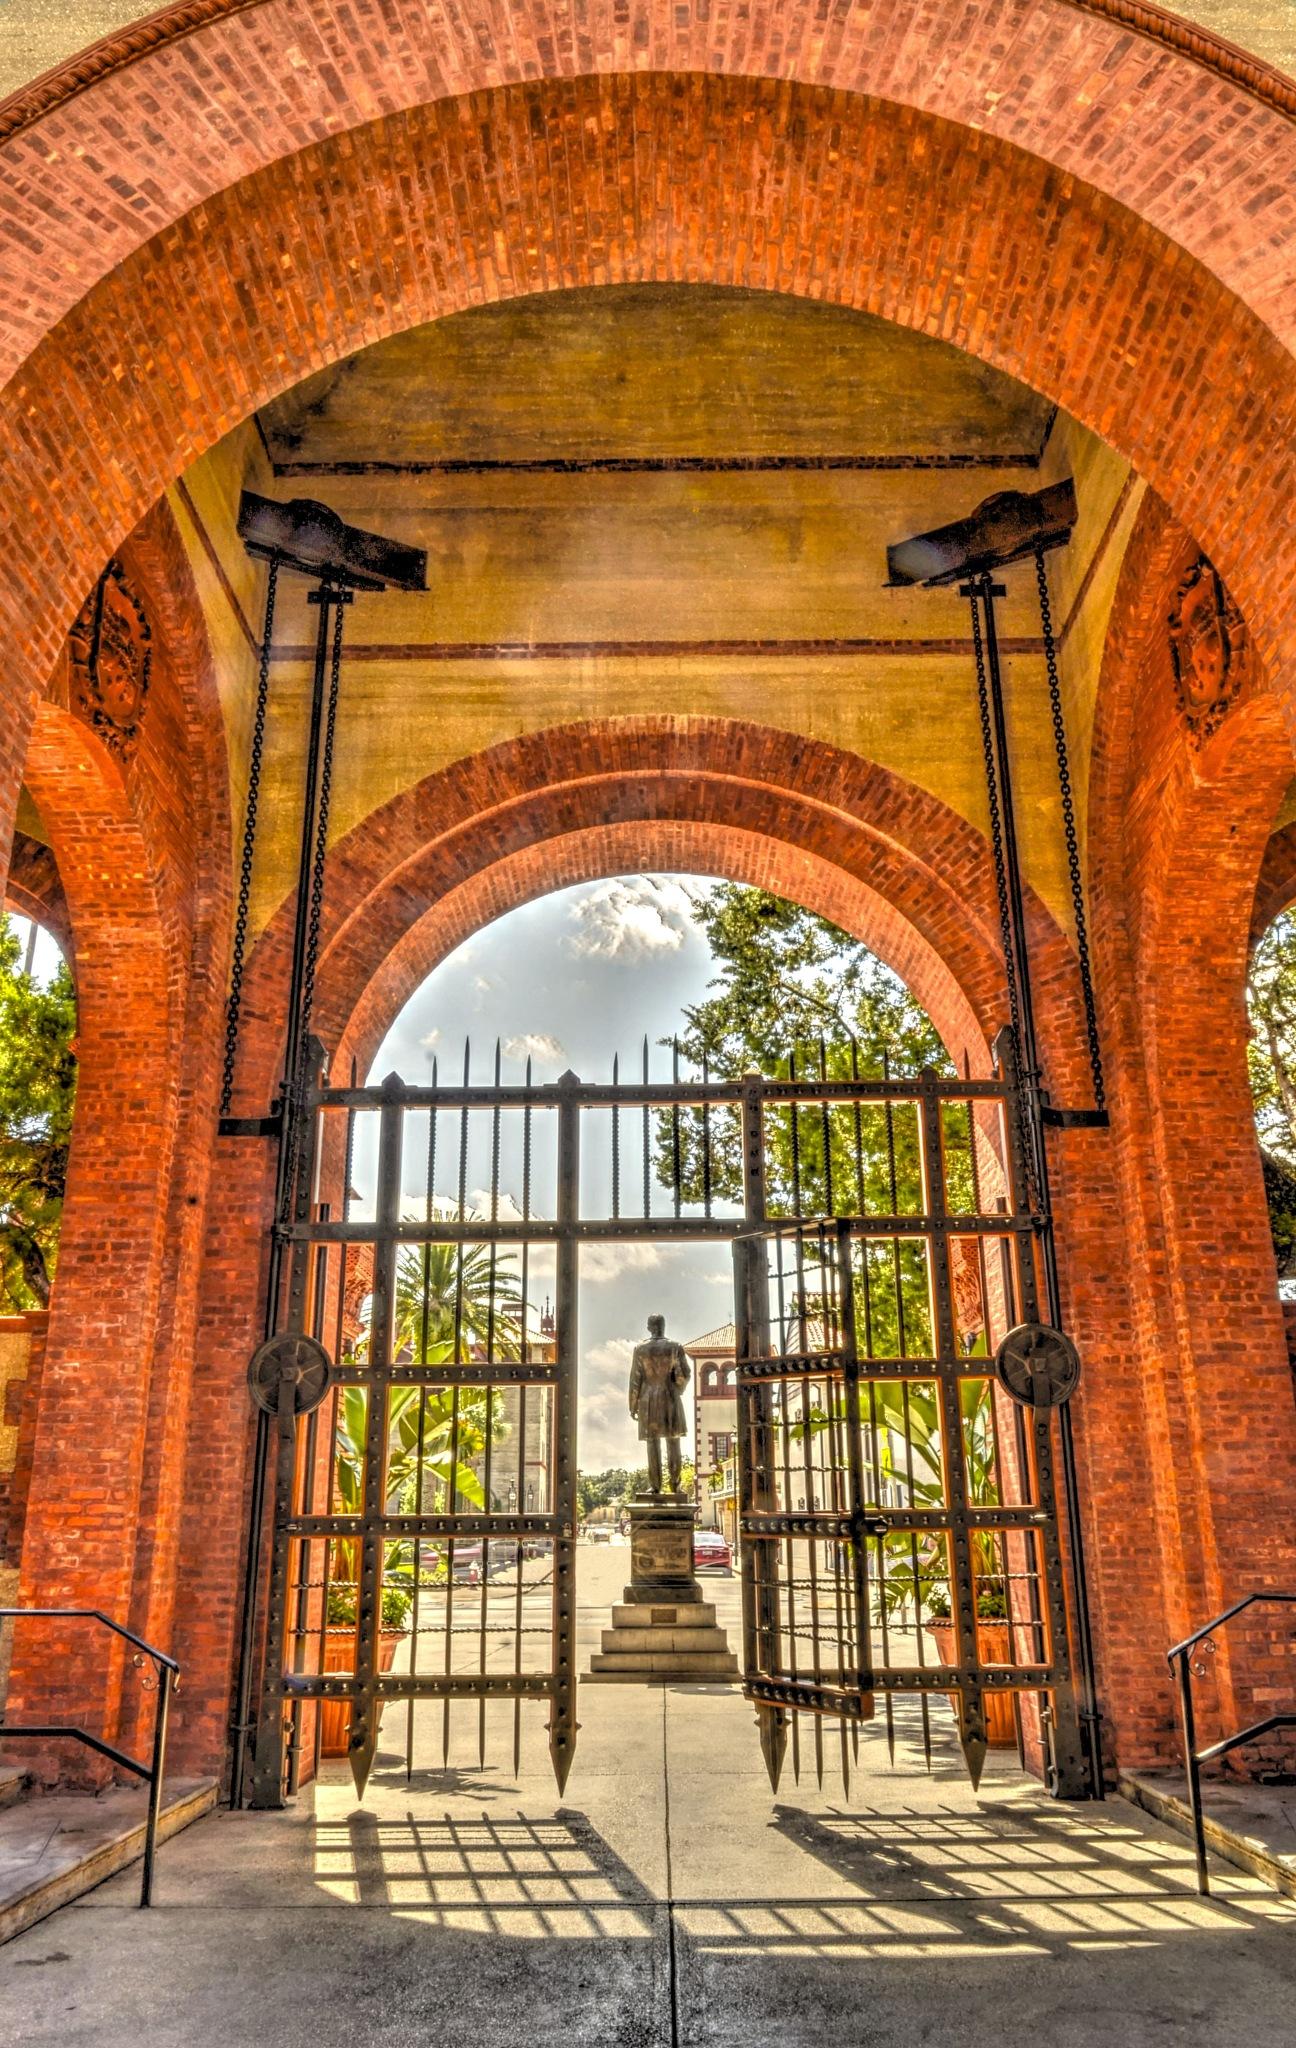 Flagler College Entrance, Saint Agustine, Florida by JoseGarrucho